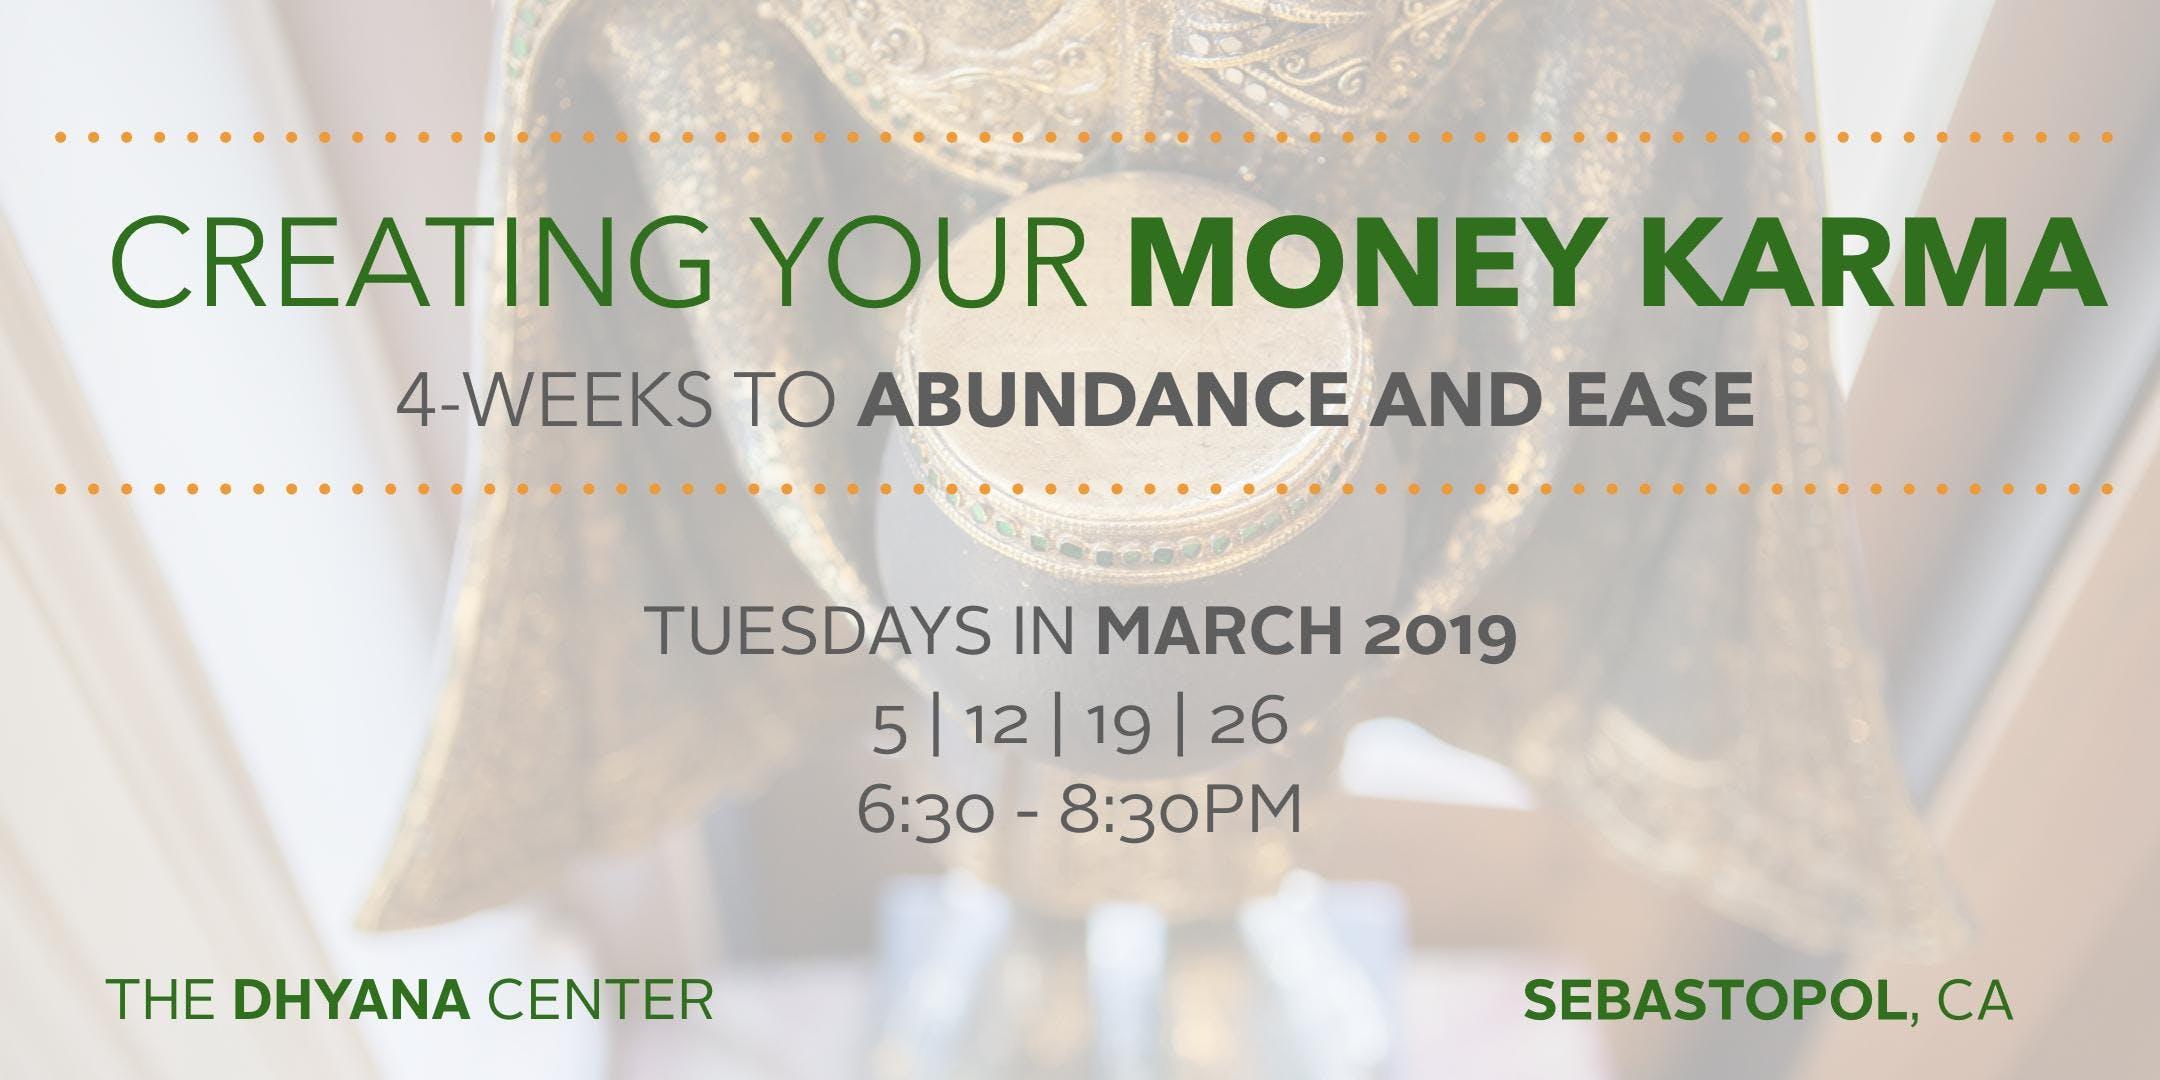 Creating Your Money Karma: 4 Weeks to Abundance and Ease